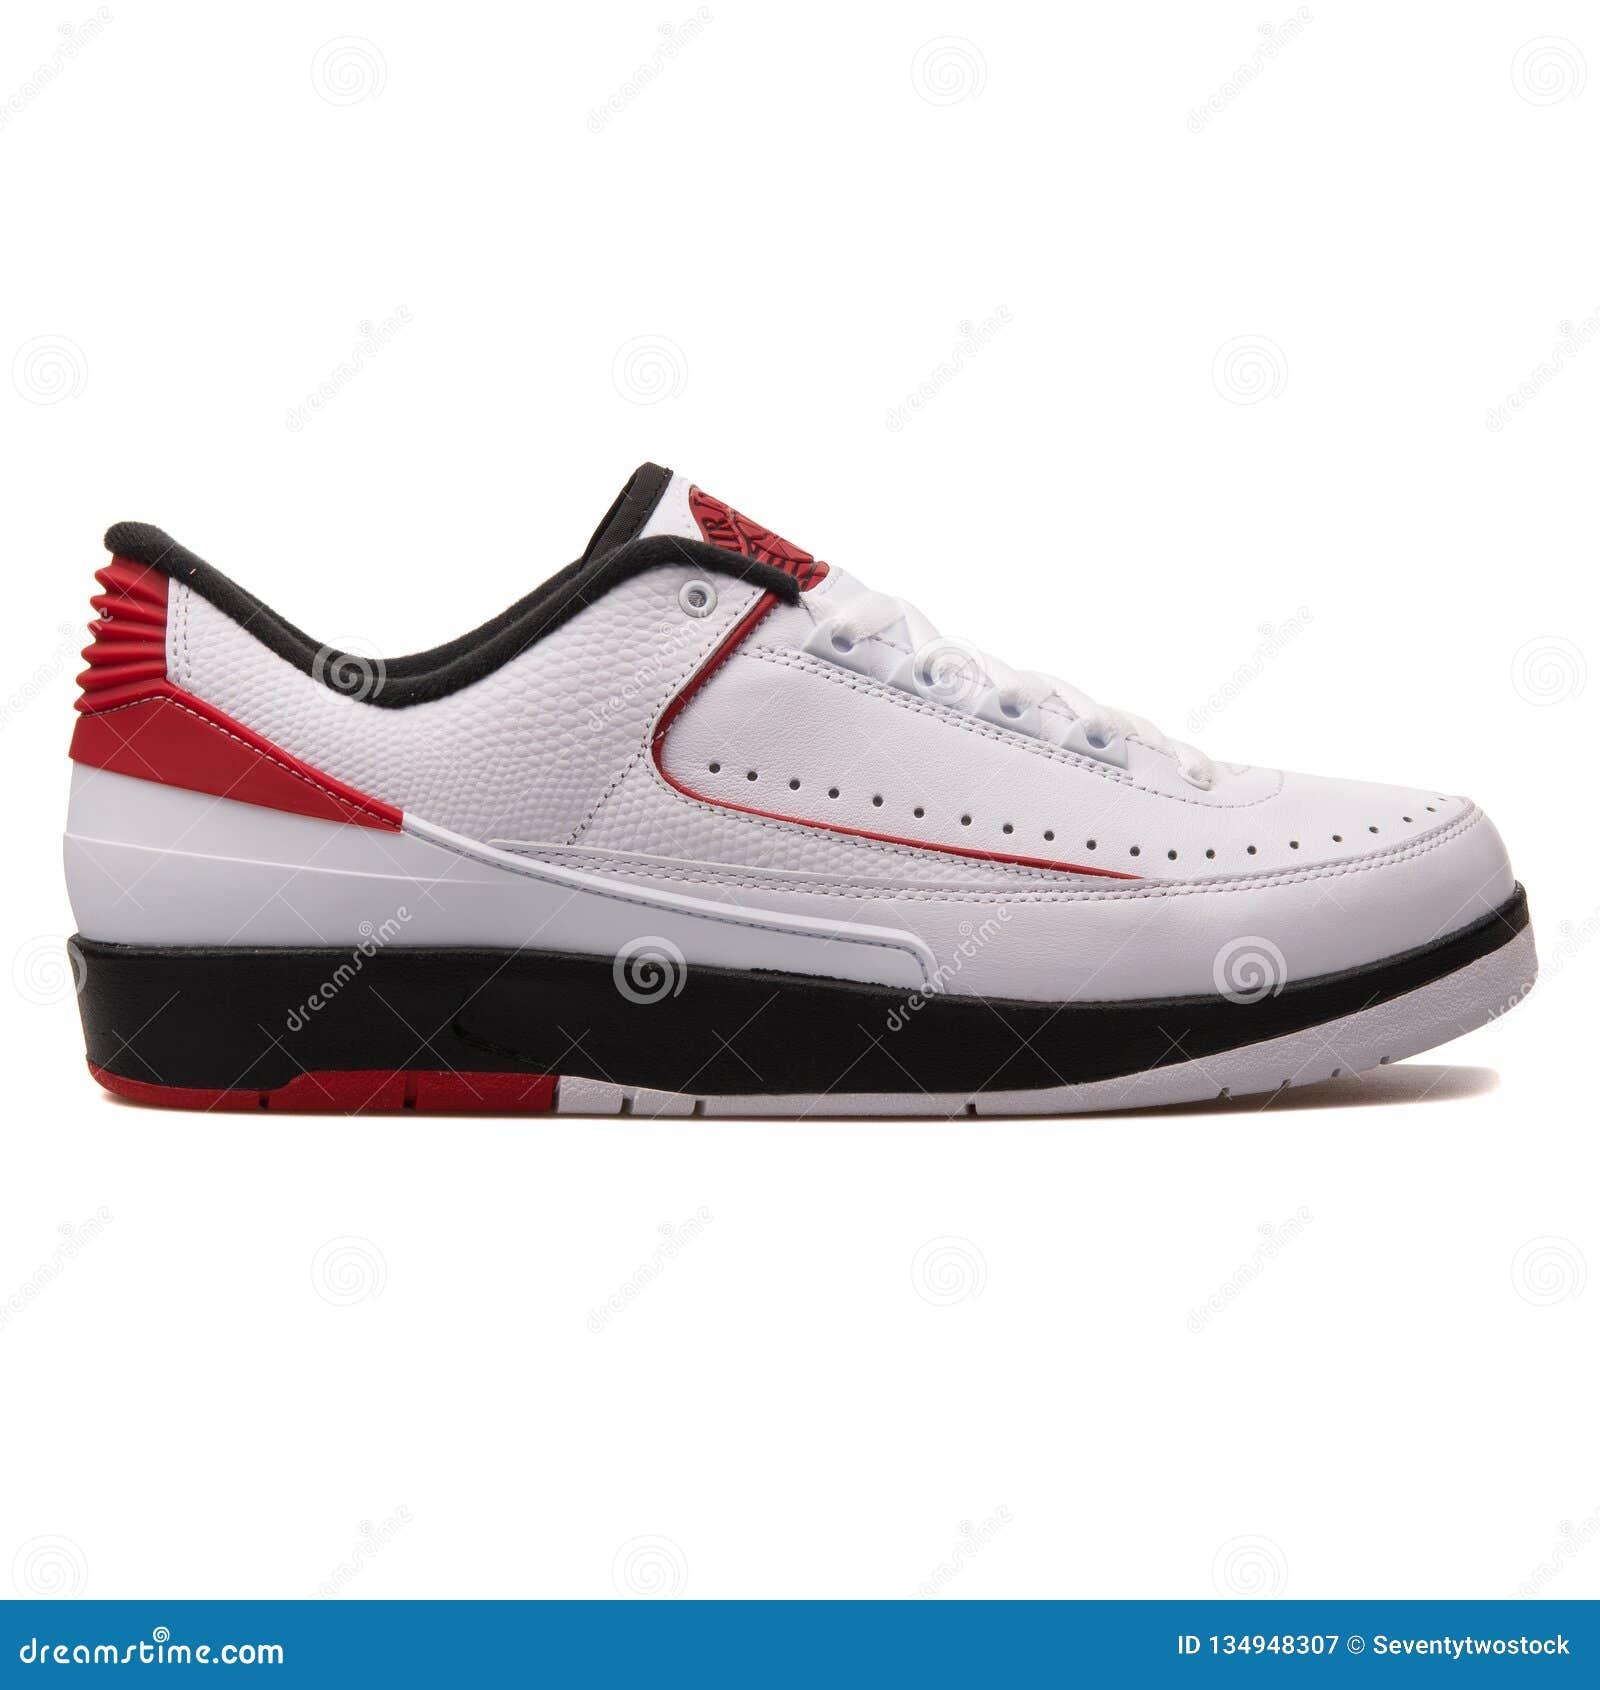 more photos d51df 0d300 Nike Air Jordan 2 Retro Low White, Black And Red Sneaker ...